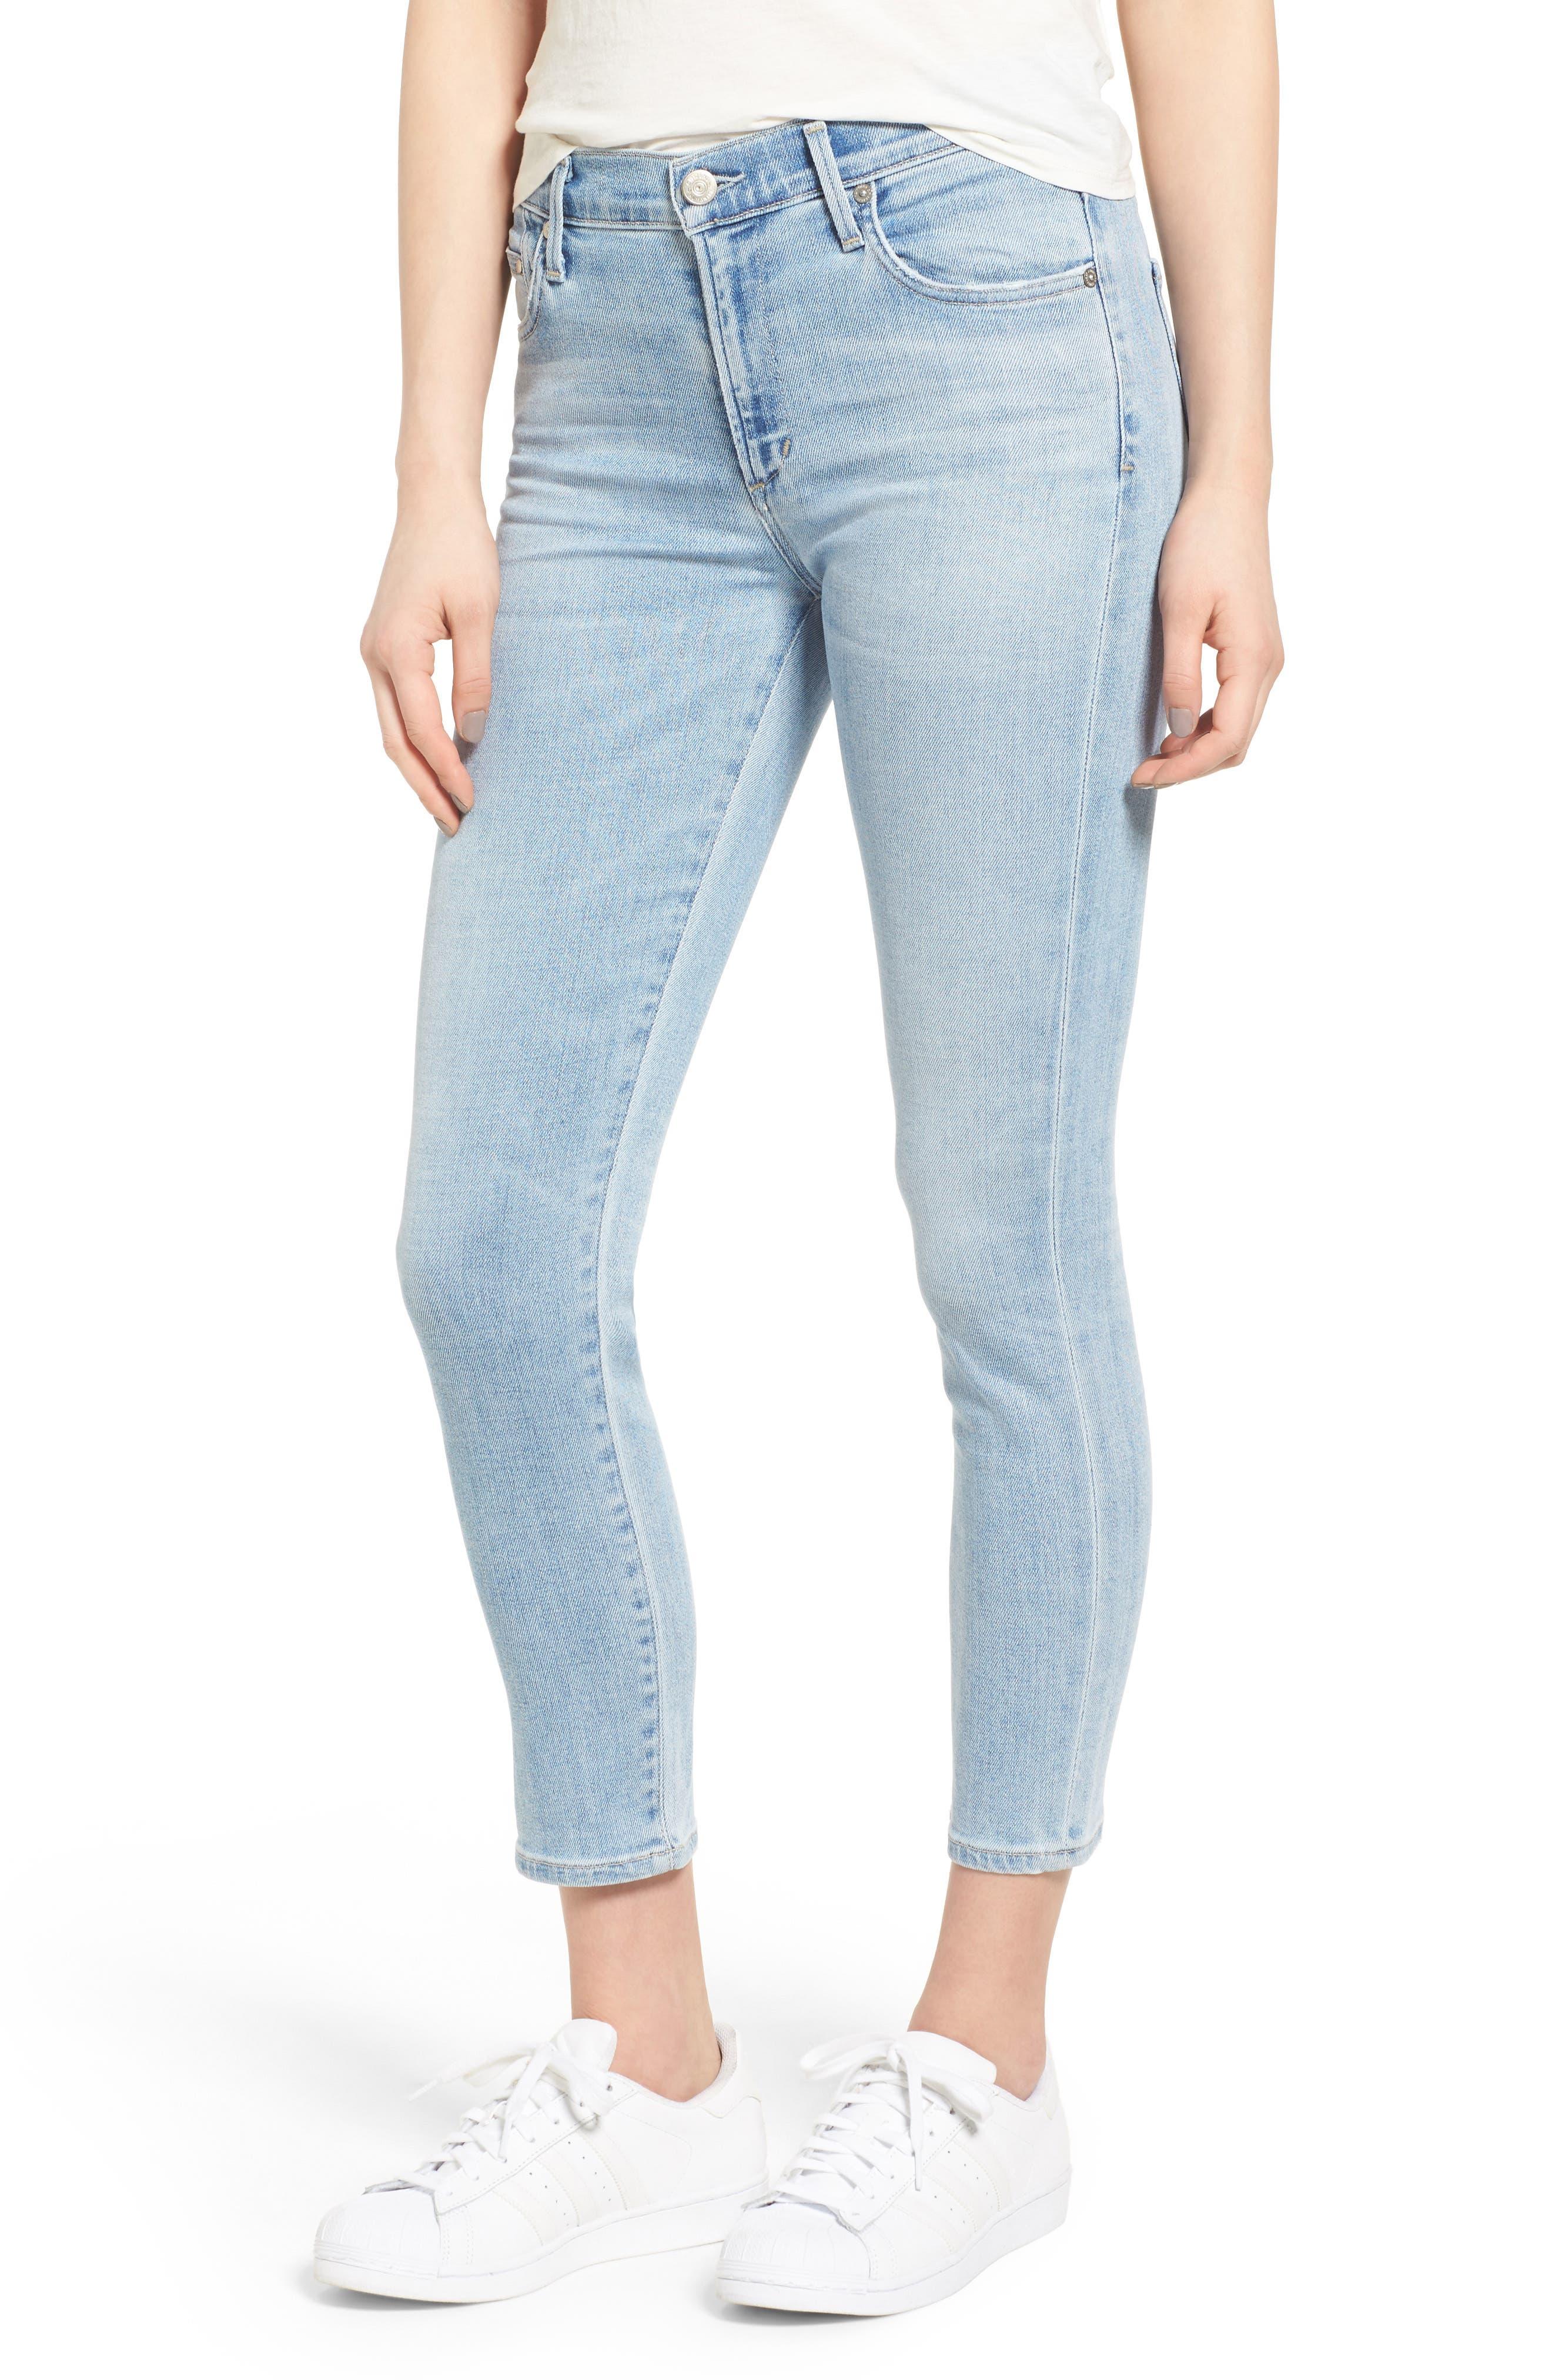 Rocket High Waist Crop Skinny Jeans,                             Main thumbnail 1, color,                             Oracle Blue